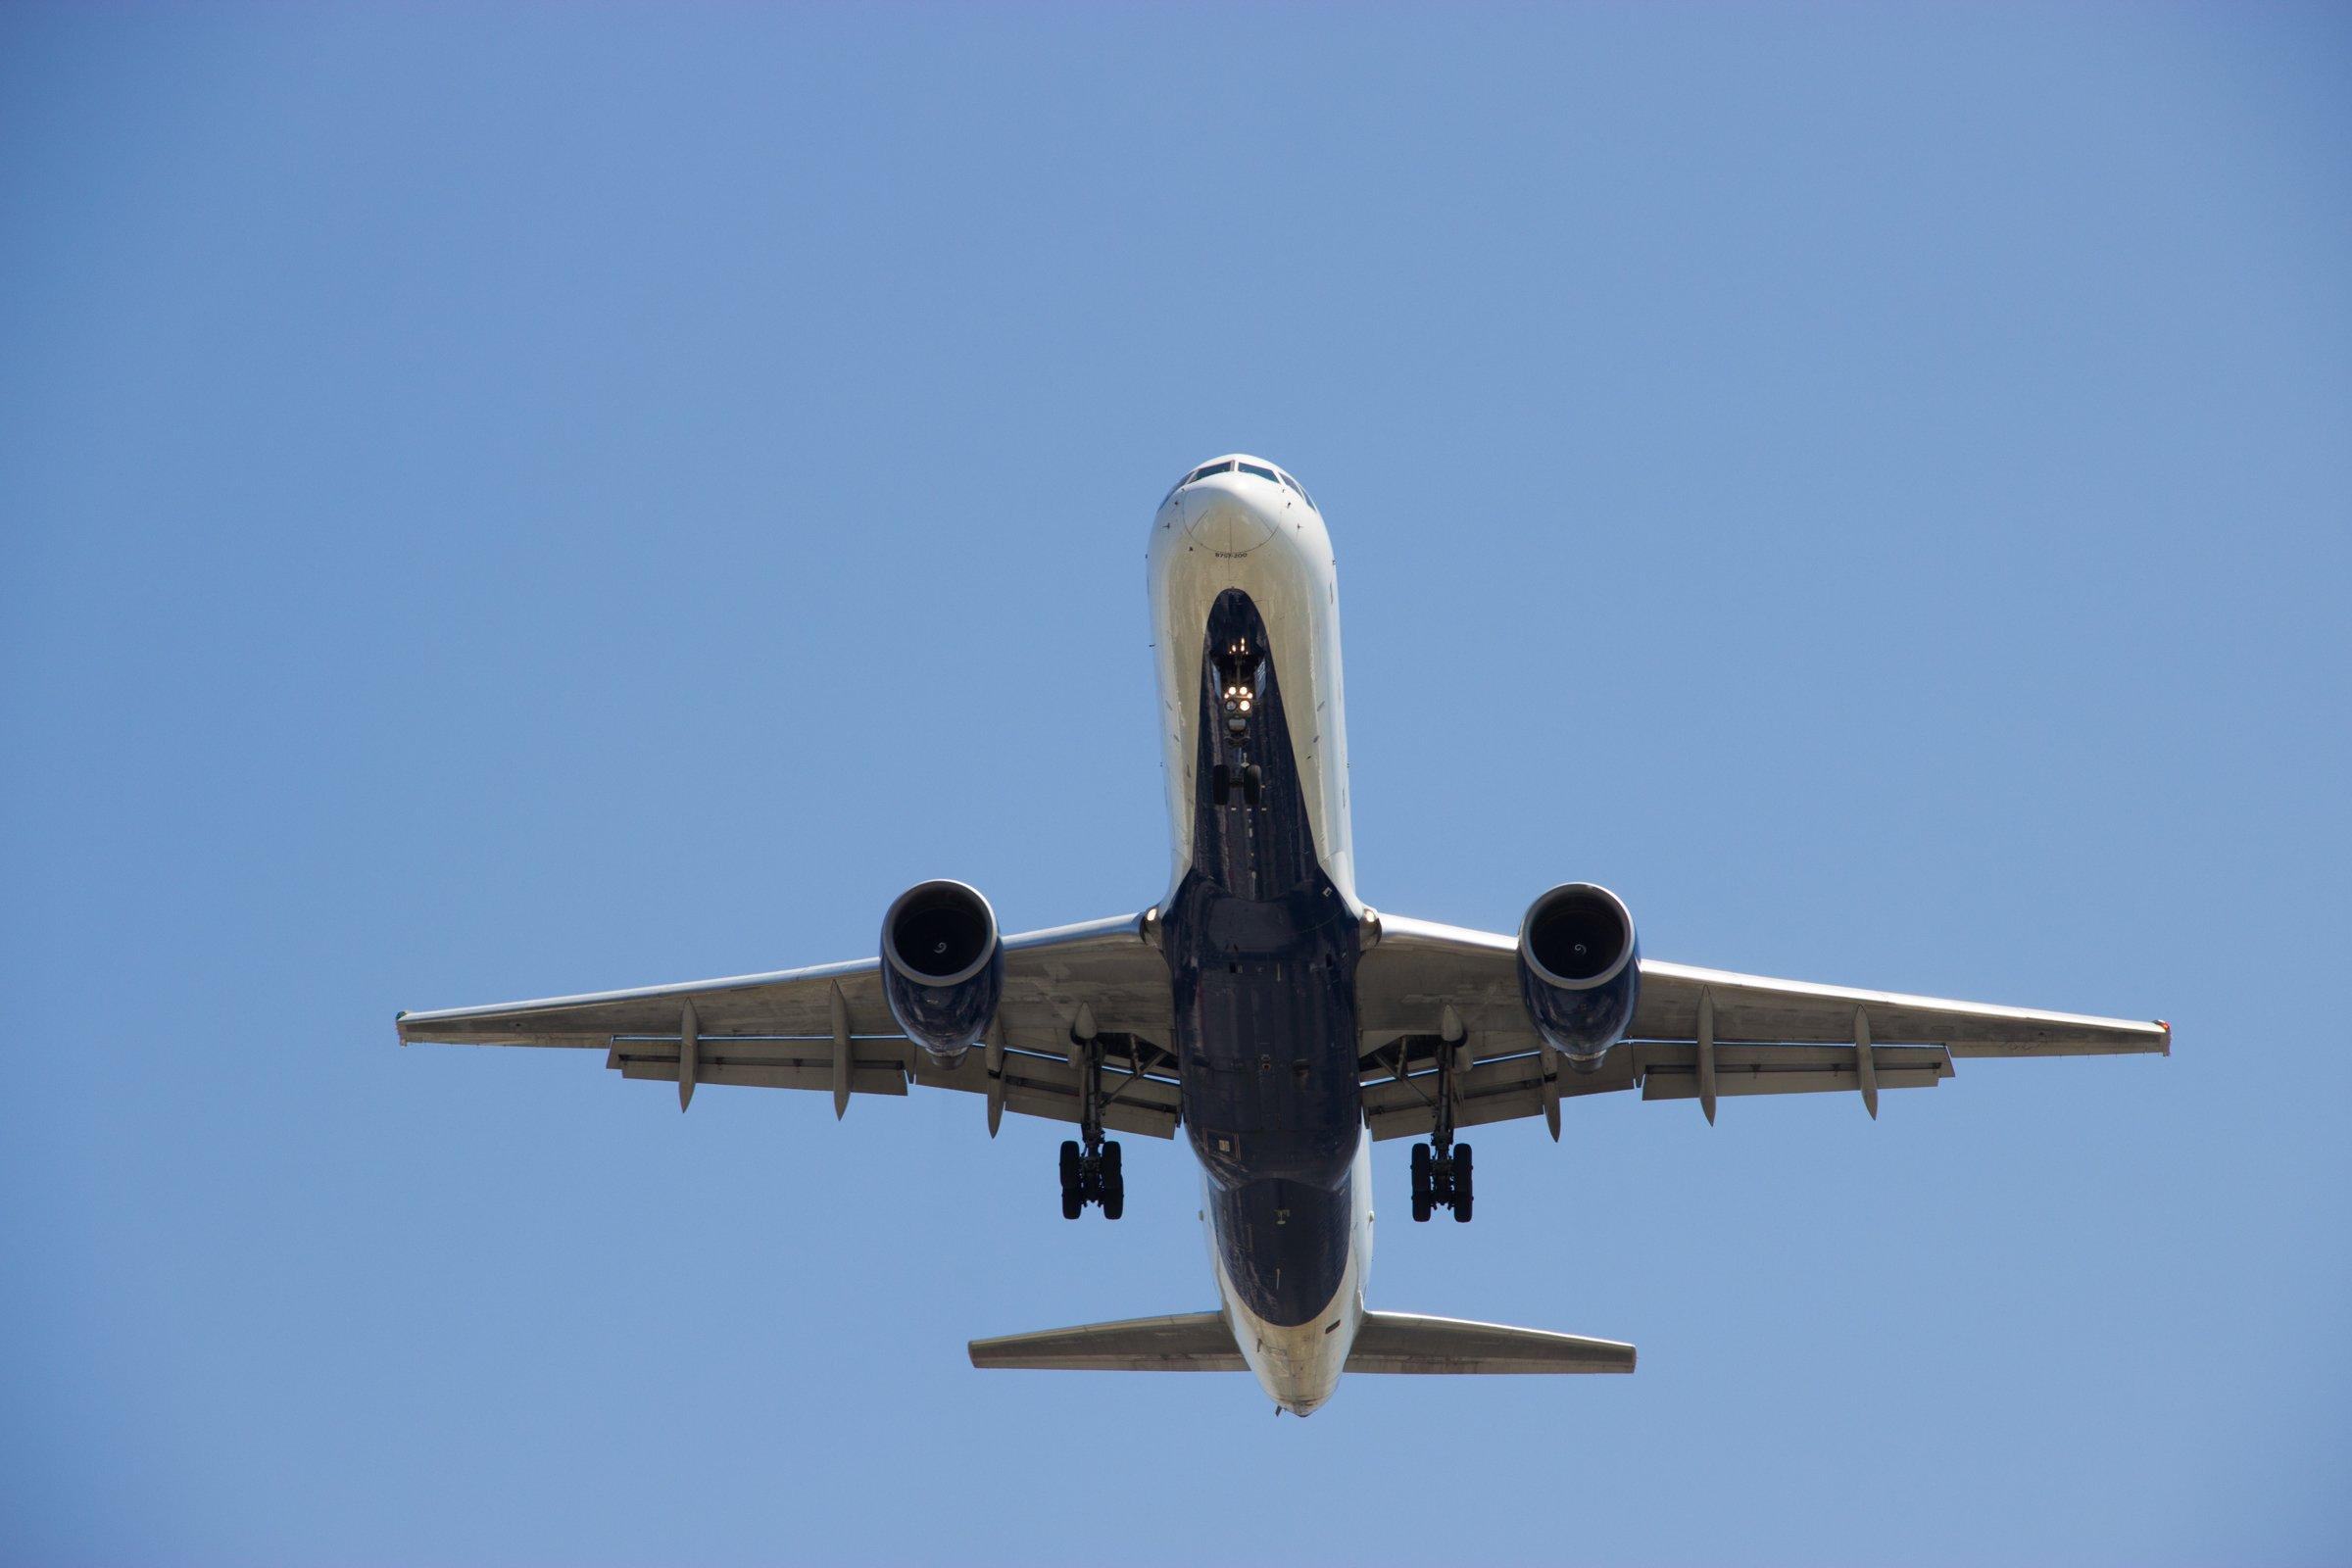 Bottom Of Plane In Clear Sky